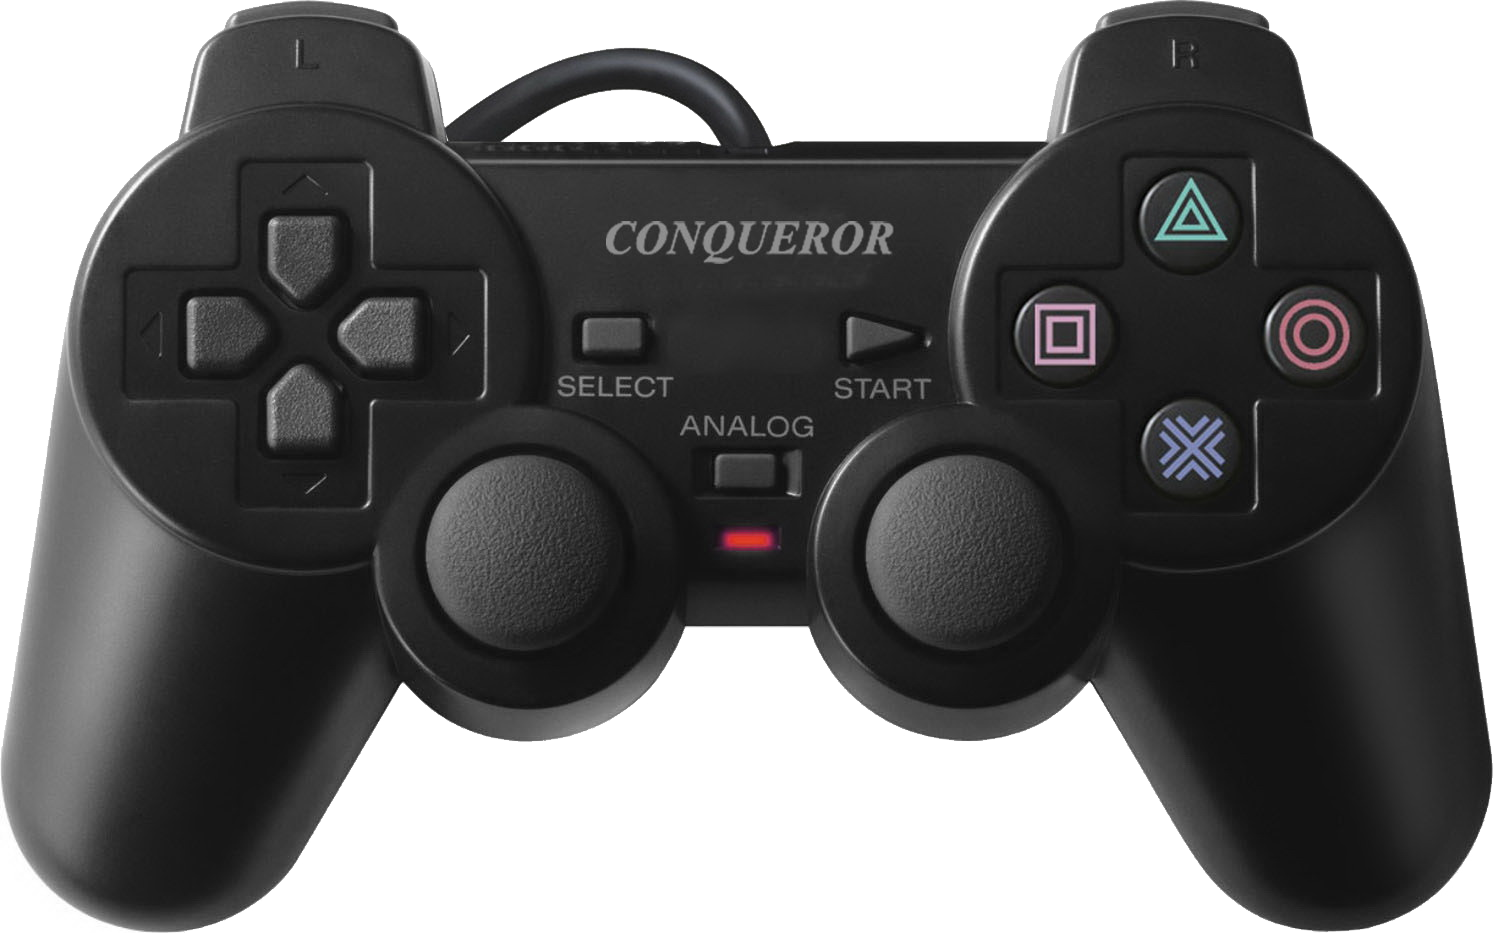 Gamepad Png Image Dualshock Playstation Sony